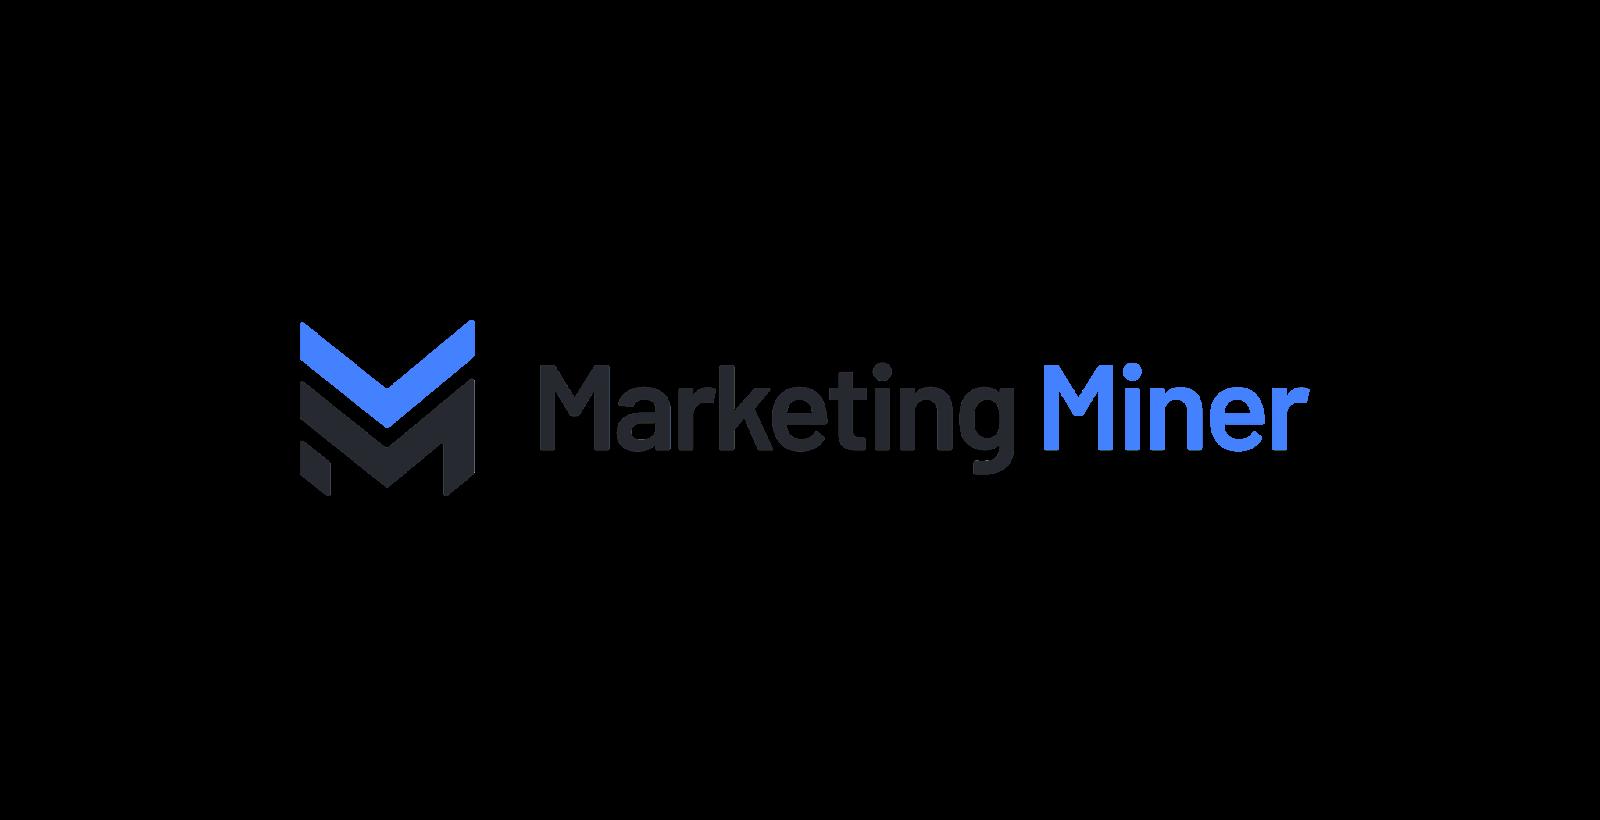 Marketing Miner - Data Mining tool